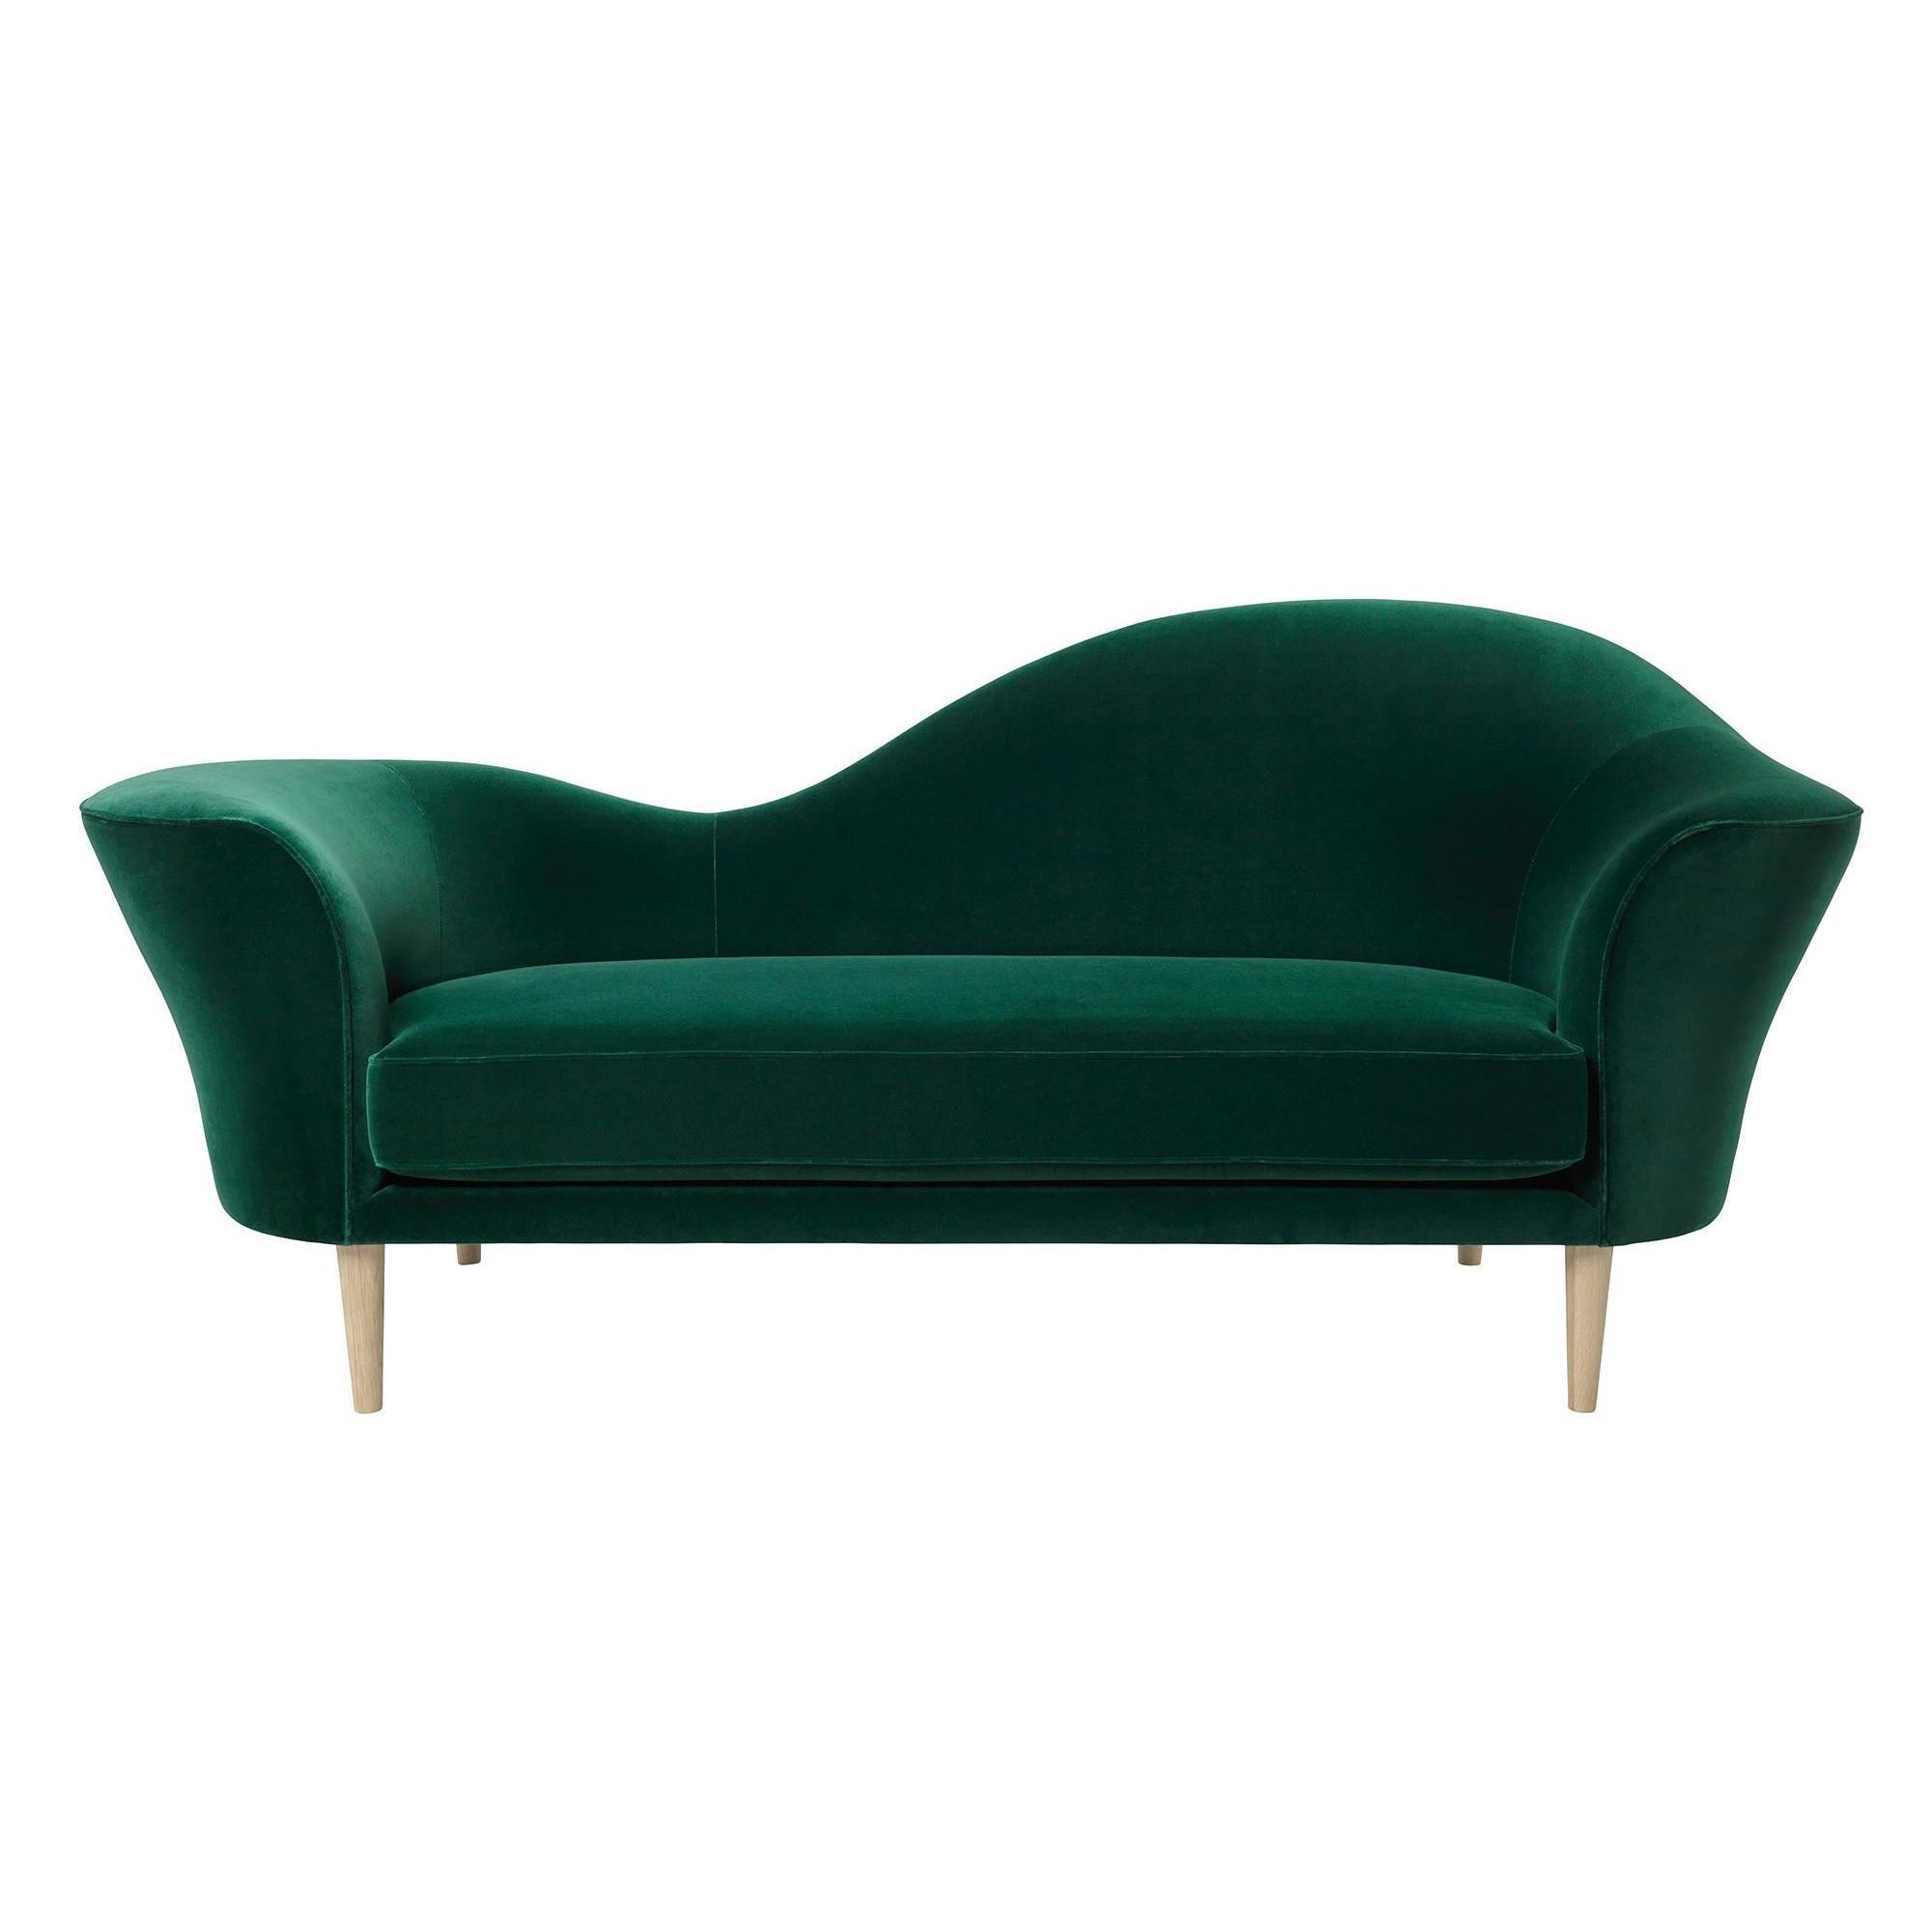 Gubi Grand Piano 3 Seater Sofa Green Fabric Velluto